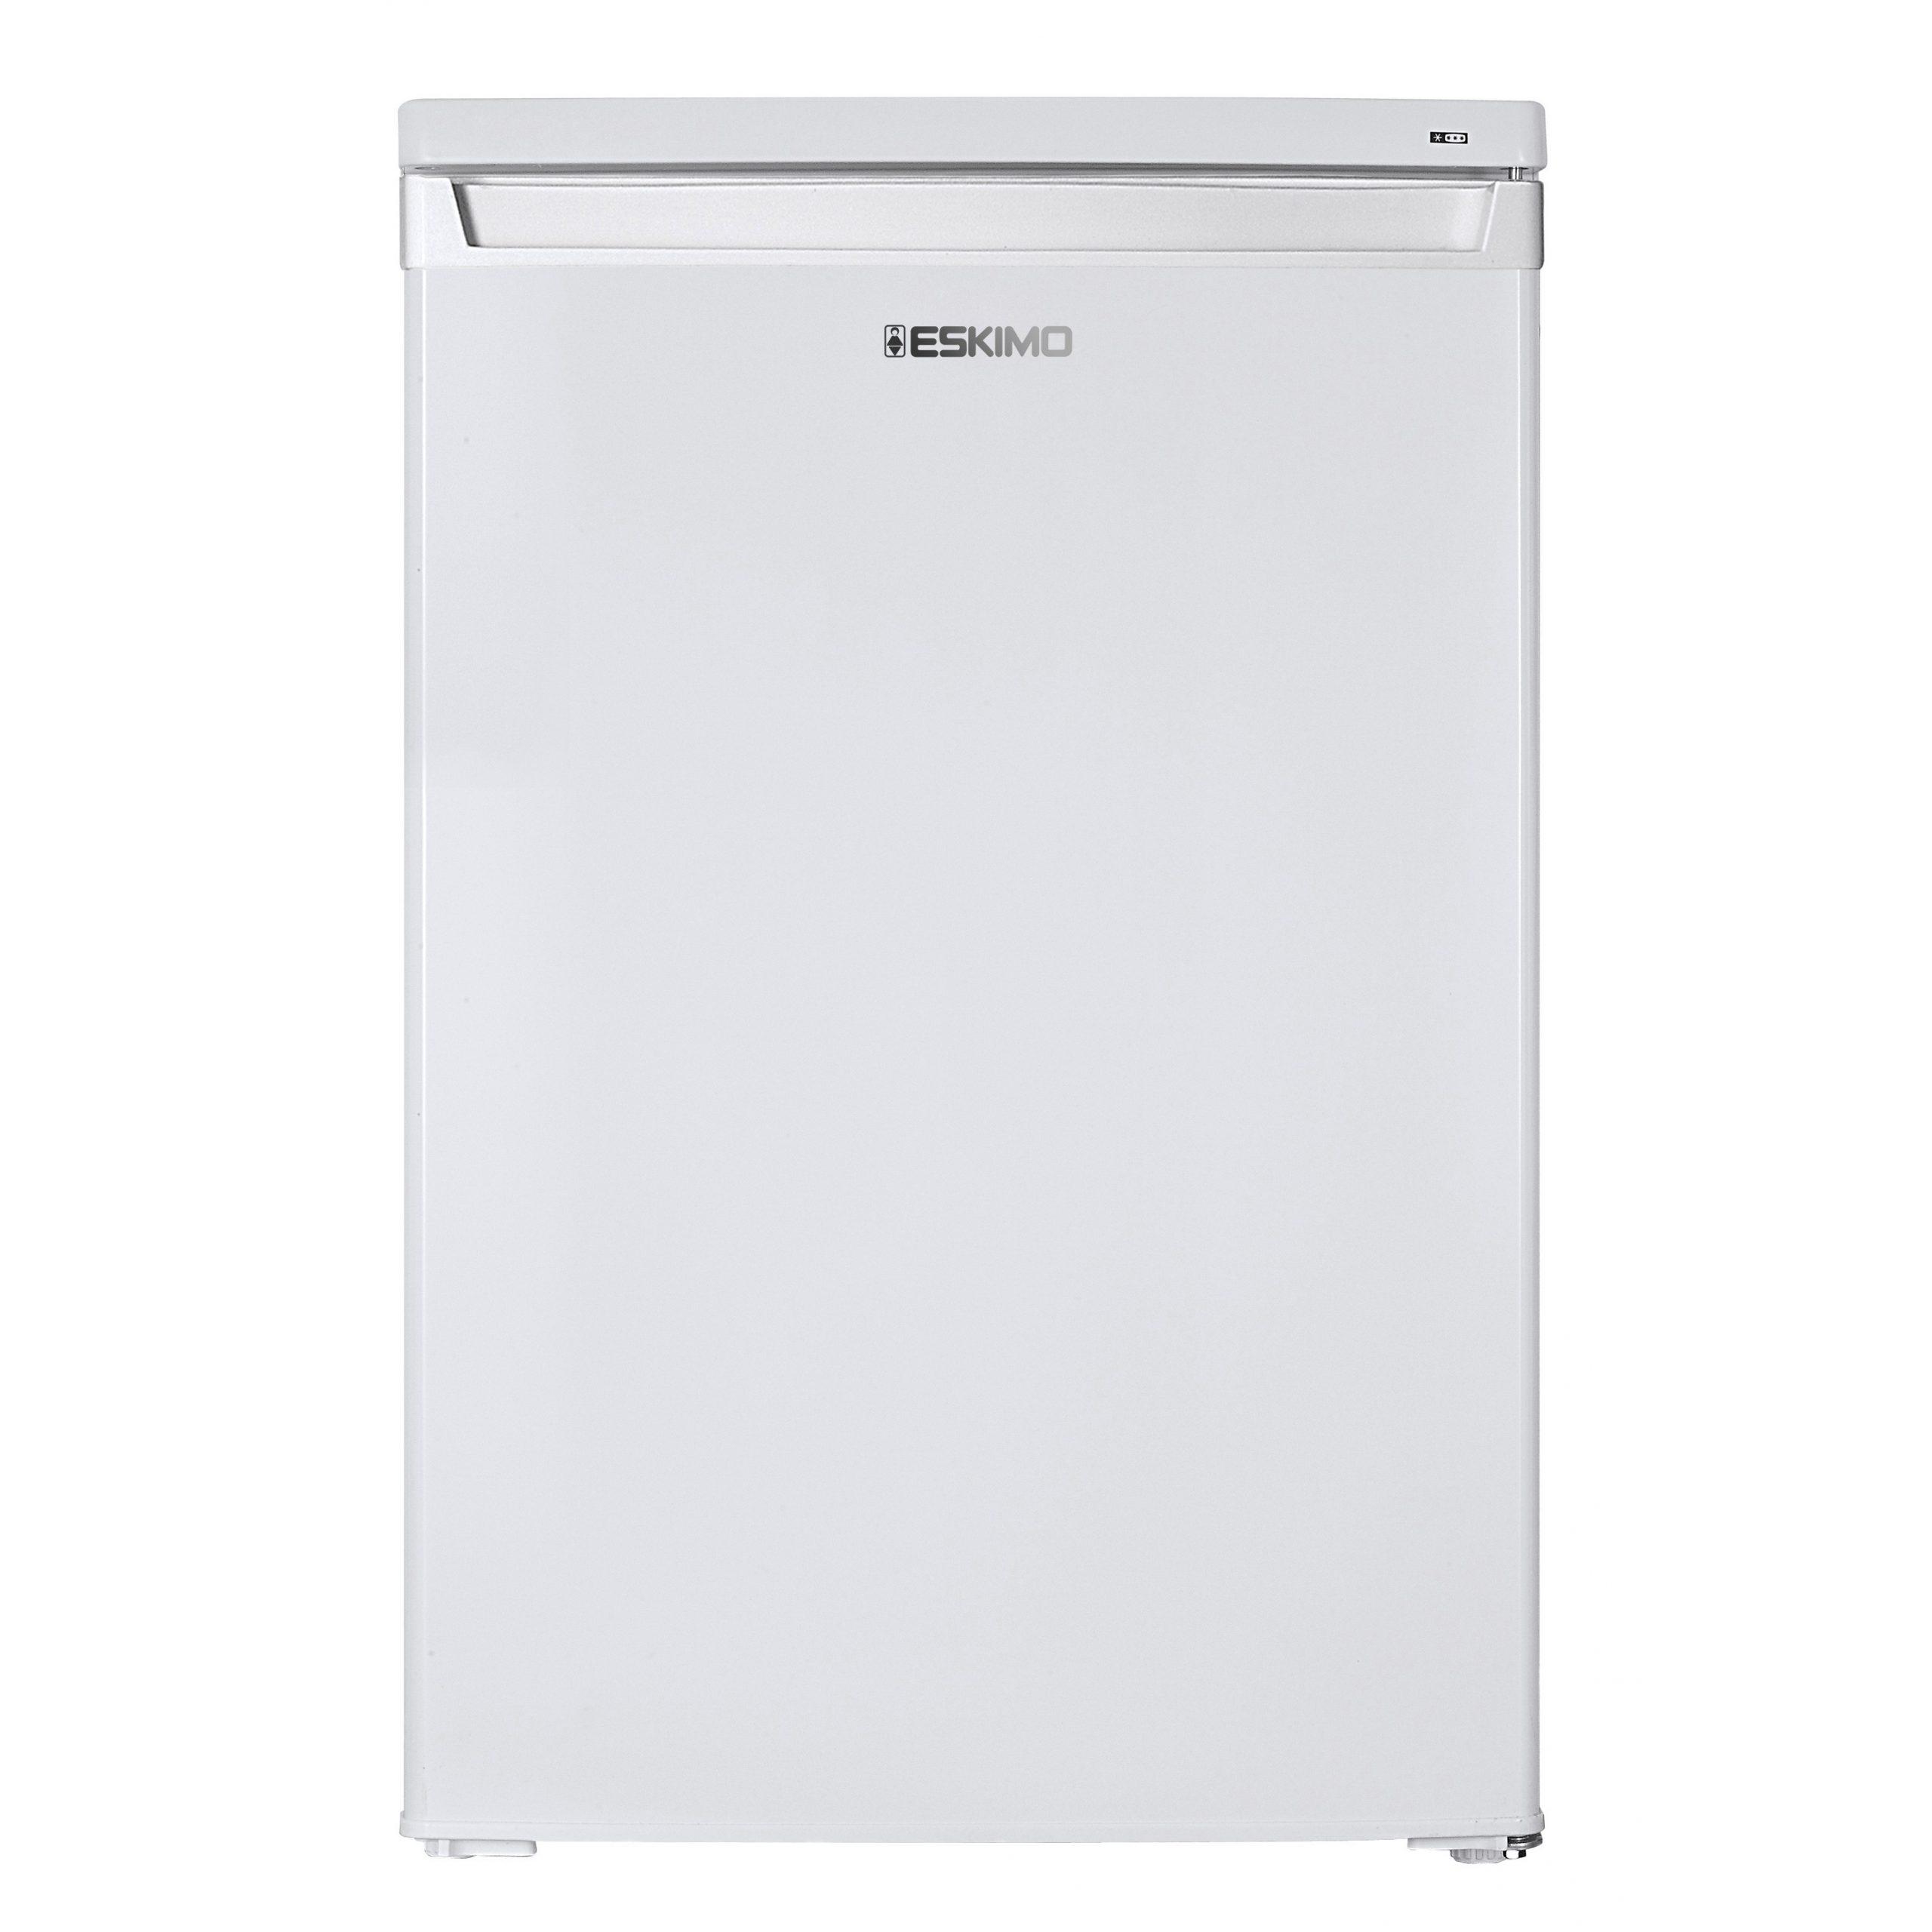 Eskimo Μονόπορτο Ψυγείο ES 8118 W